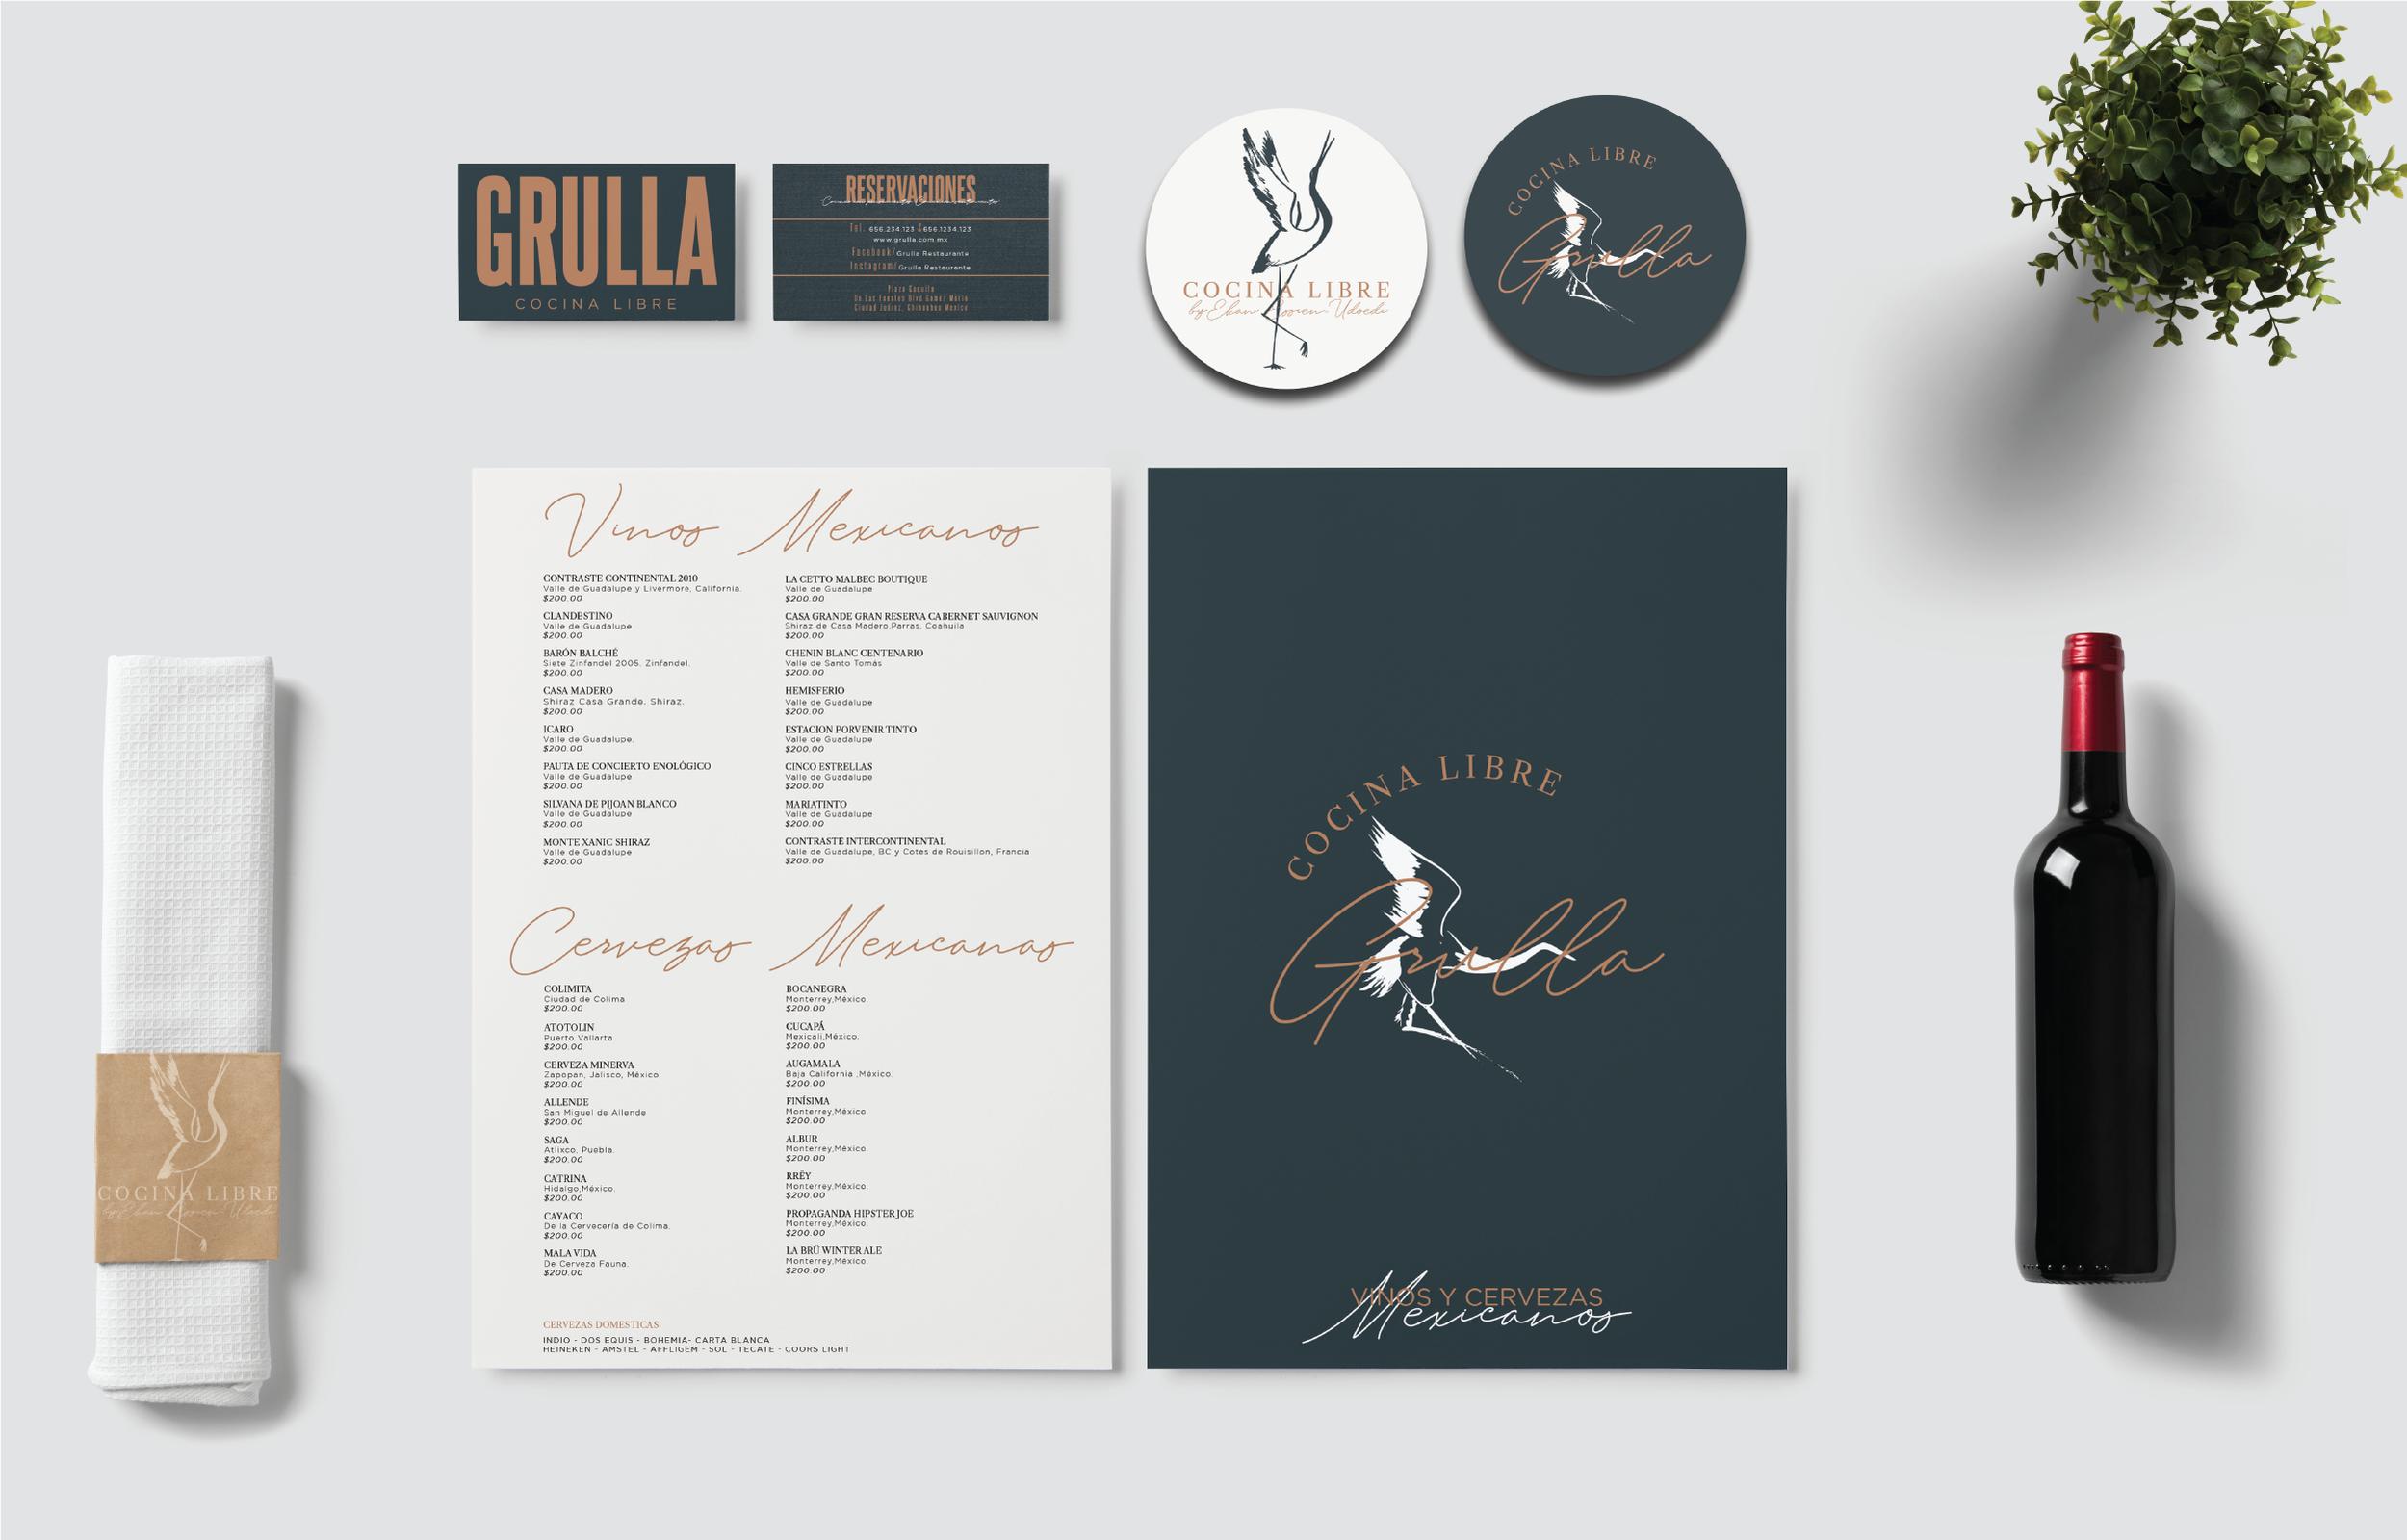 Grulla+Portafolio-11.png